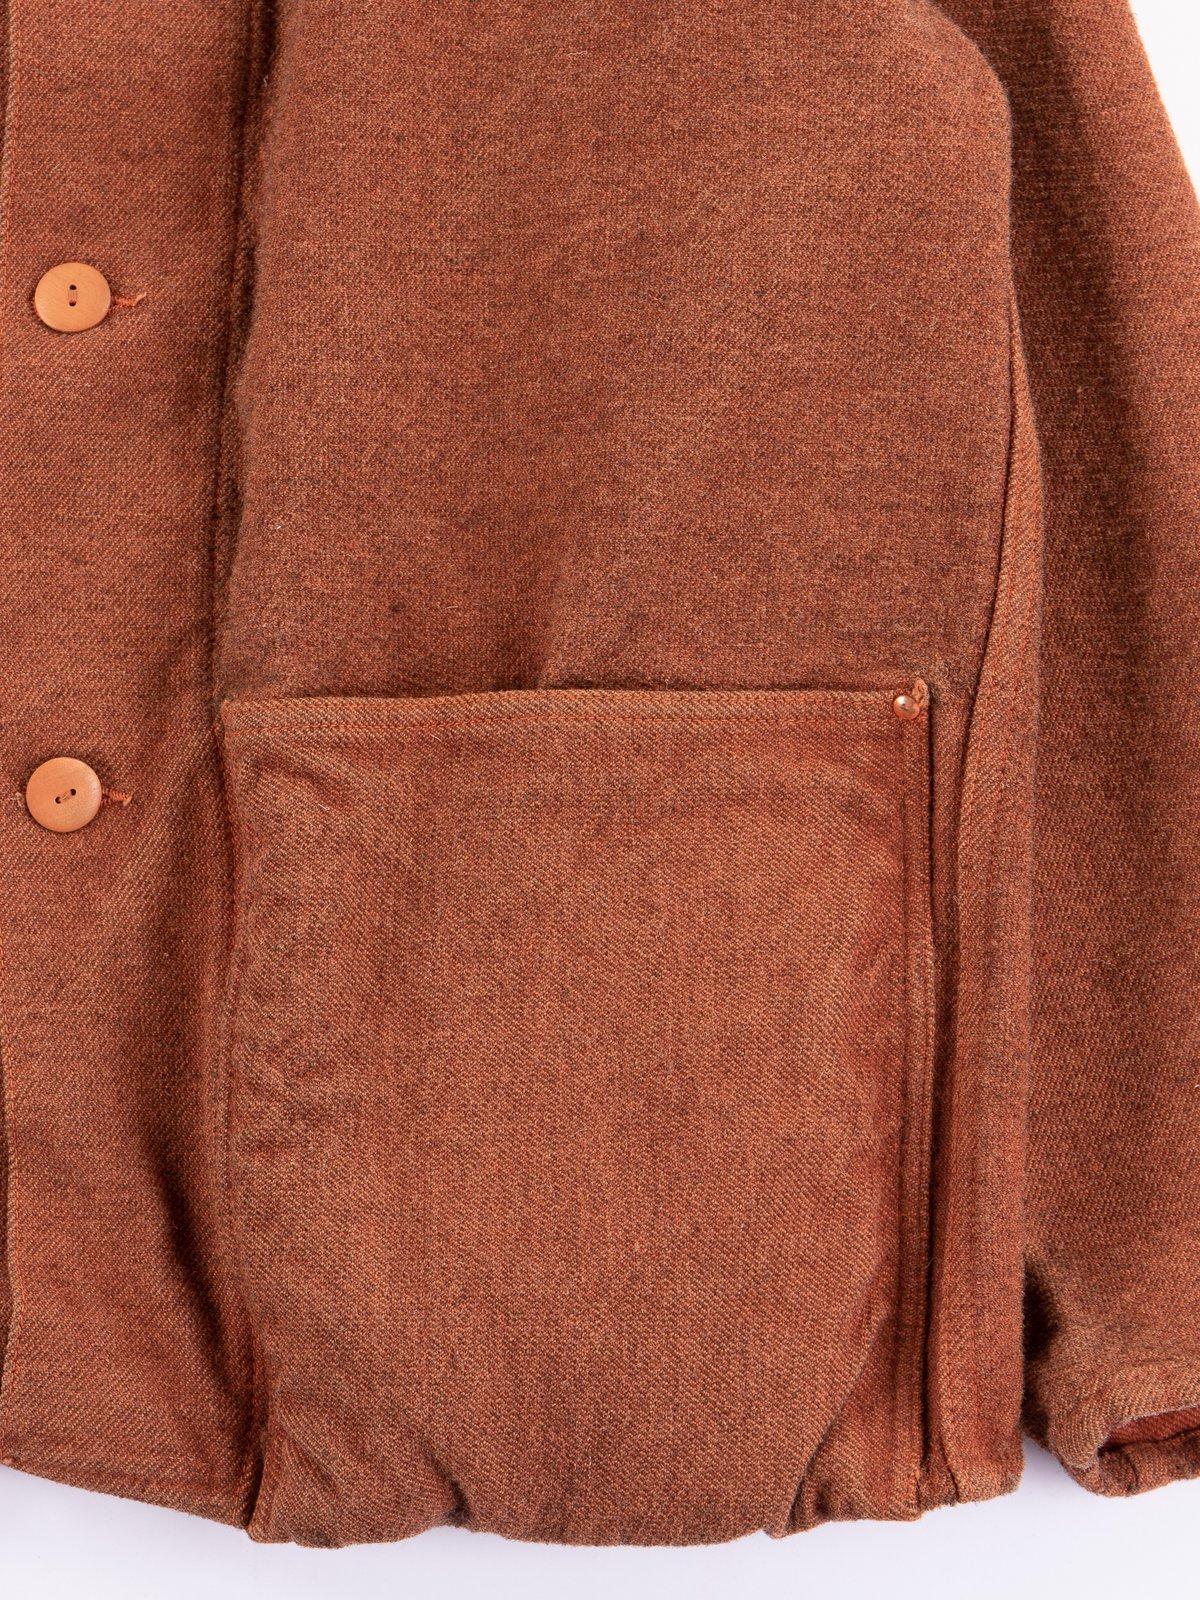 Red Ochre Dye Collared Shepherd's Coat - Image 4